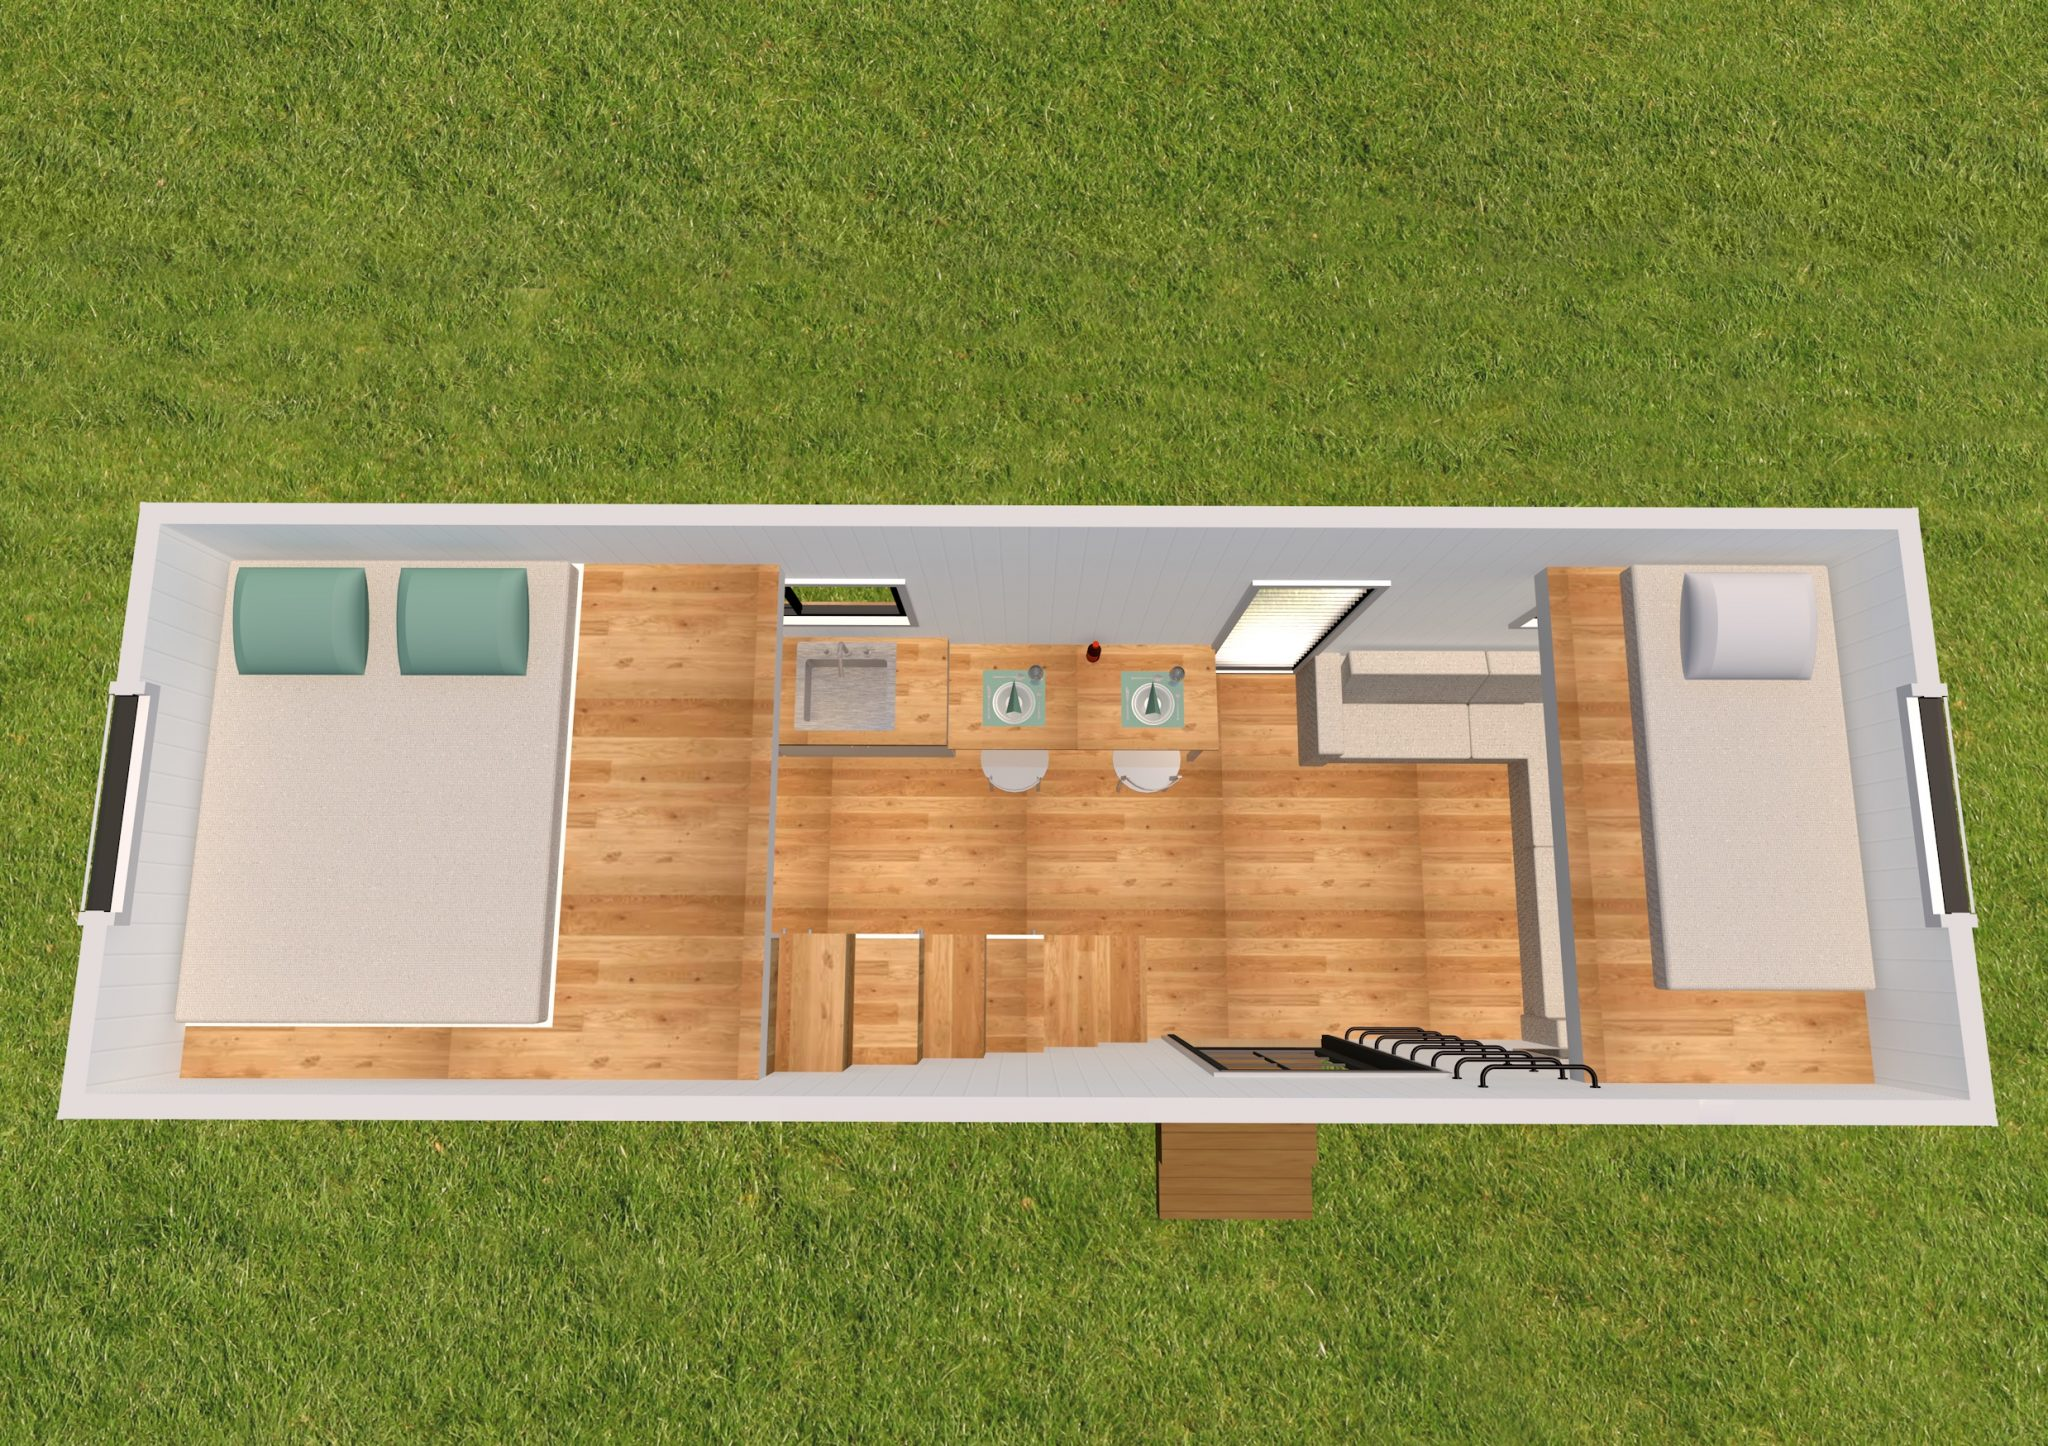 Lifestyle Series 7200DL Base Model Loft